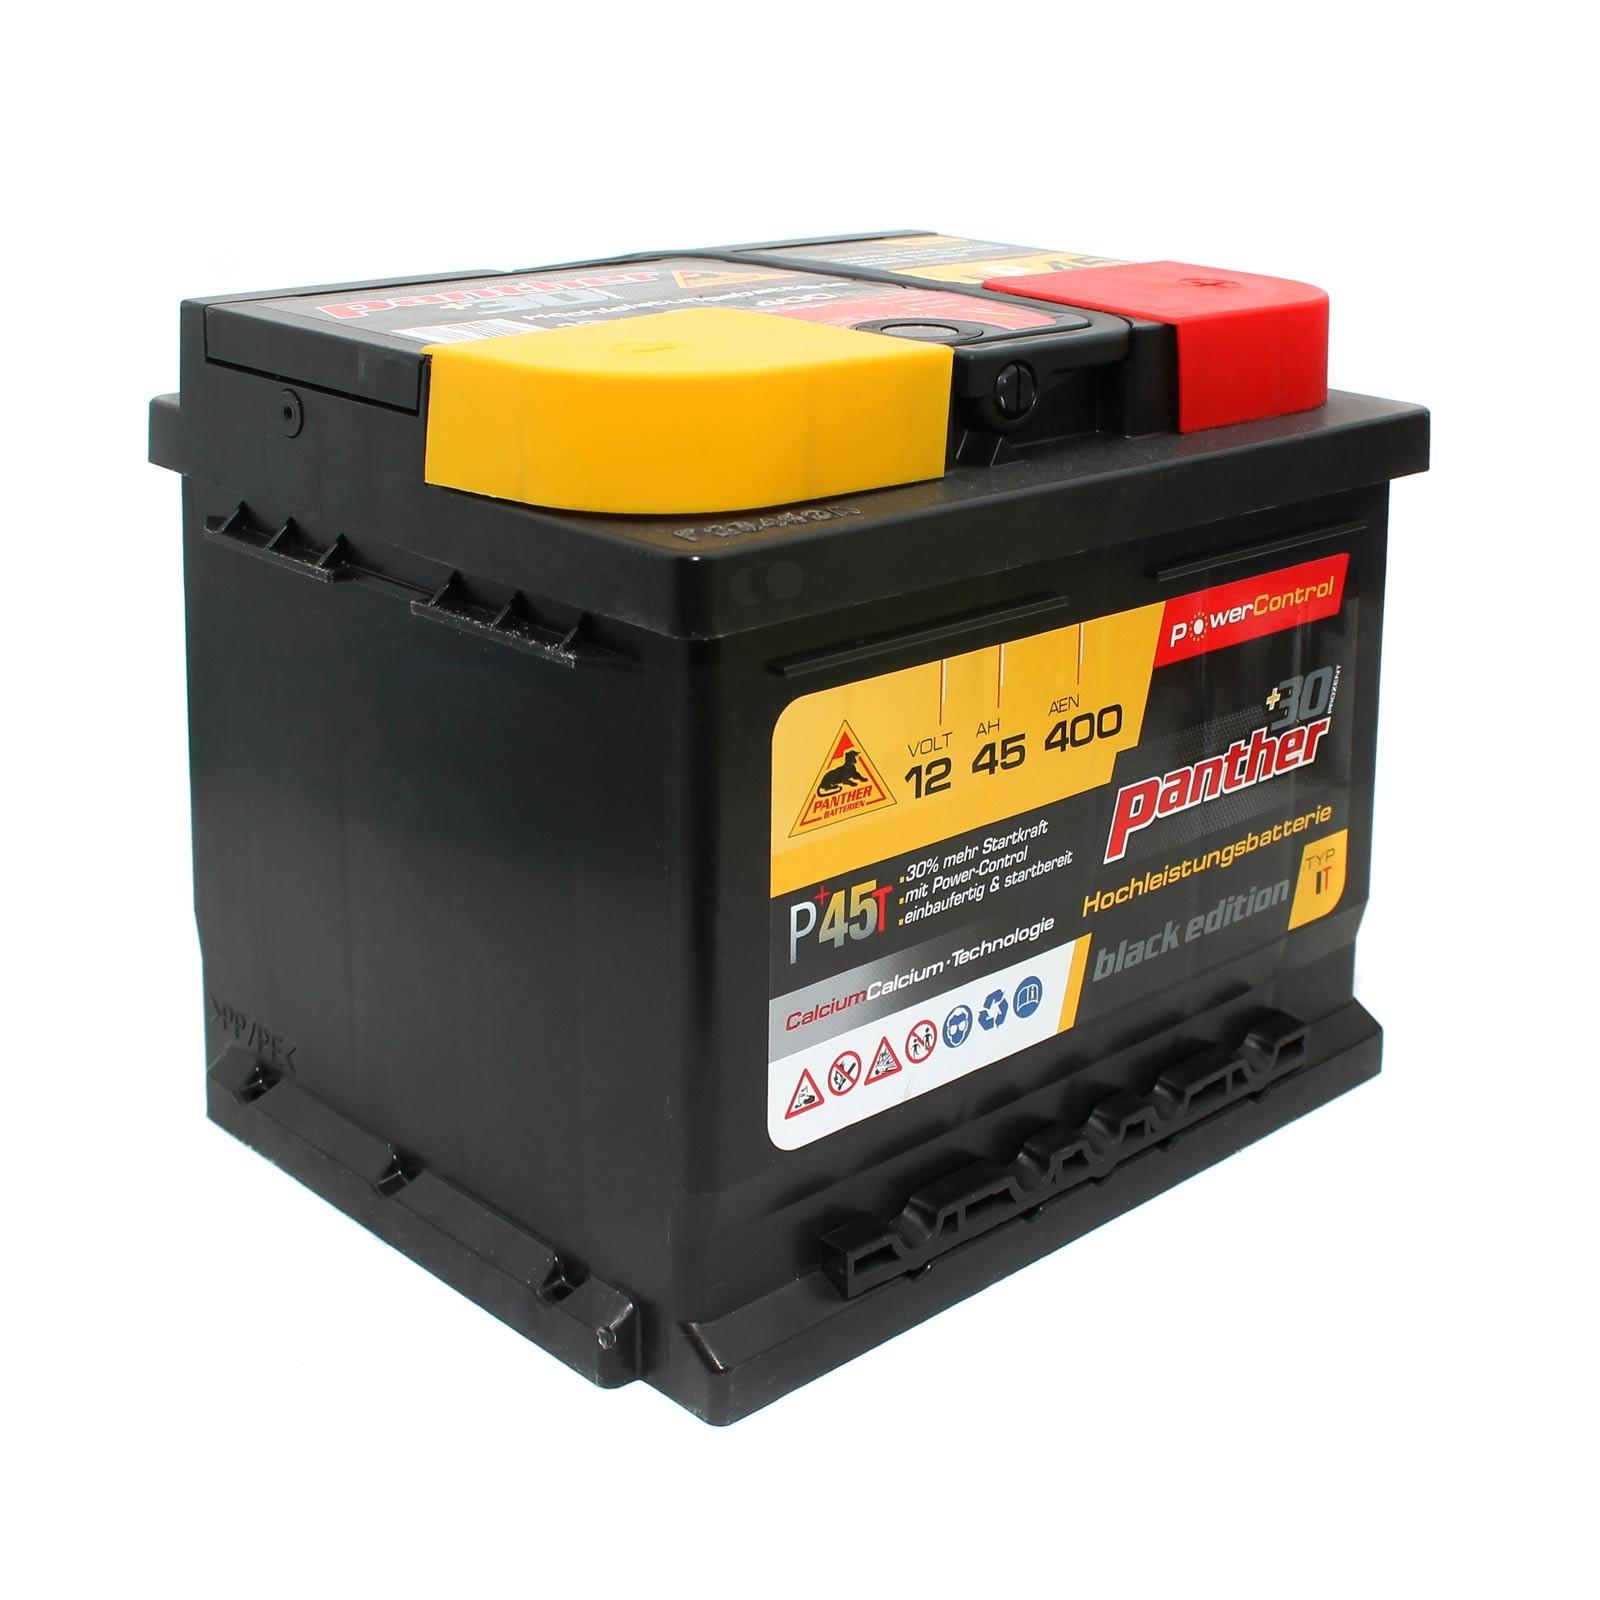 12v 45ah 400a Auto Batterie Panther Black Edition P 45t Power